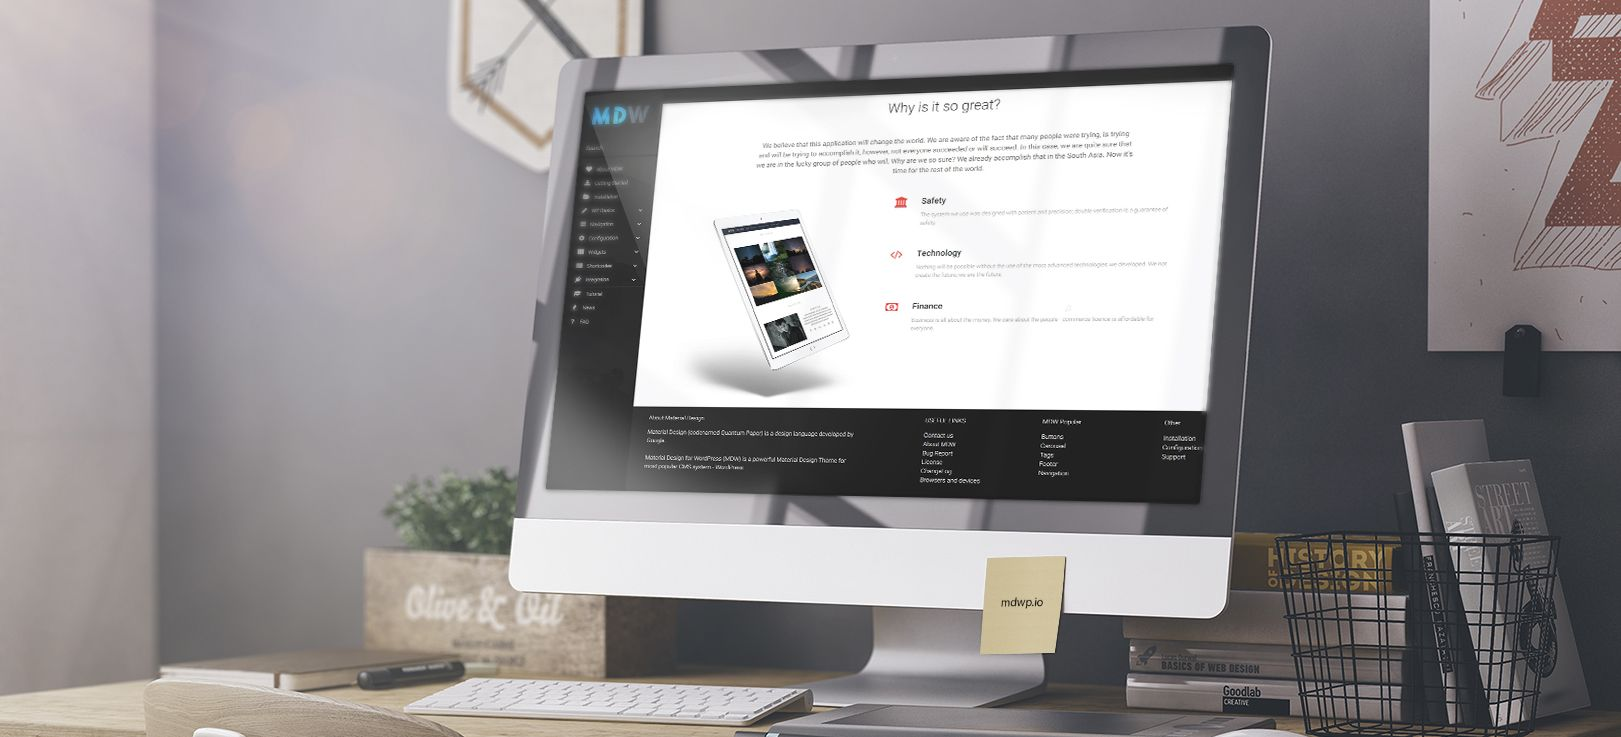 MDW WordPress Tutorial Features